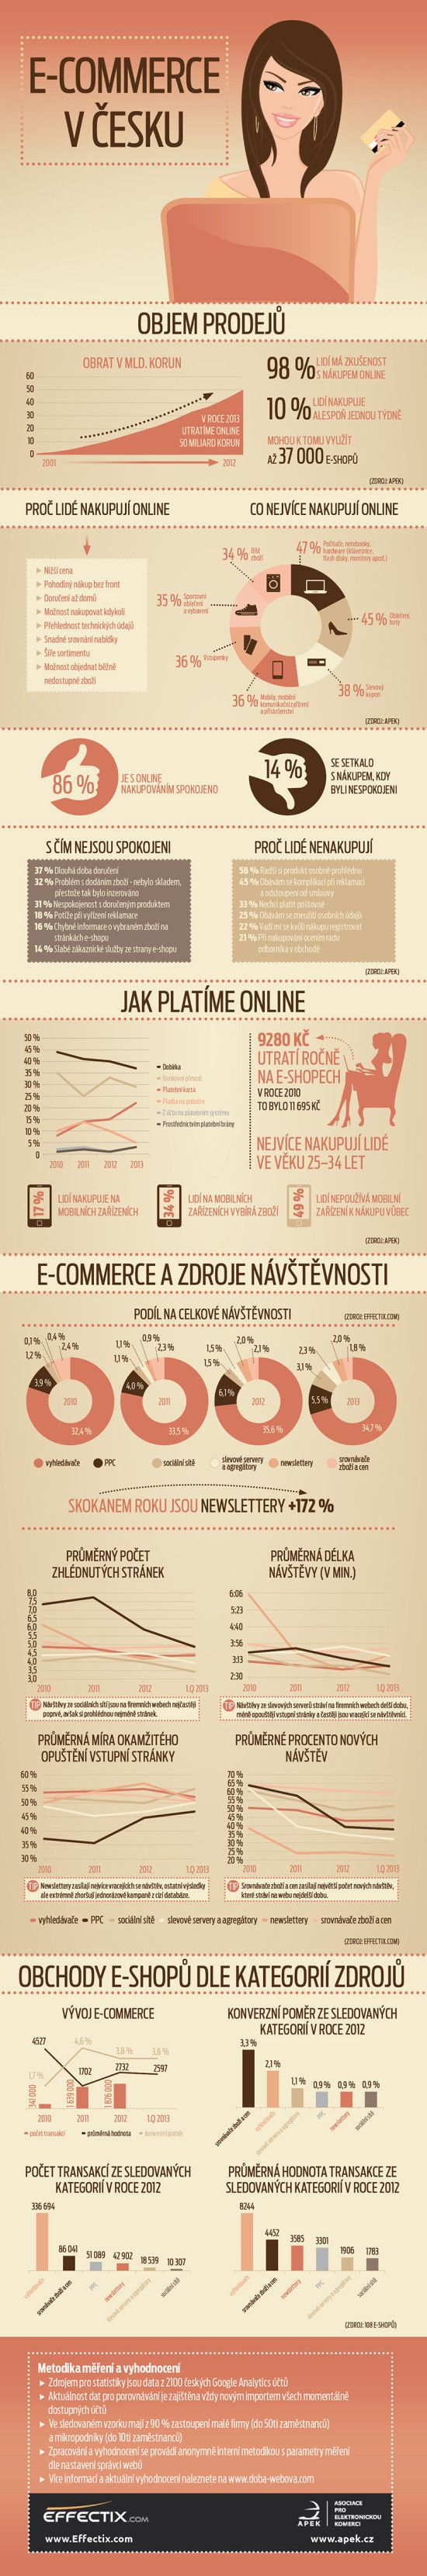 E-commerce v Česku (E-COMMERCE V ČESKU - INFOGRAFIKA)